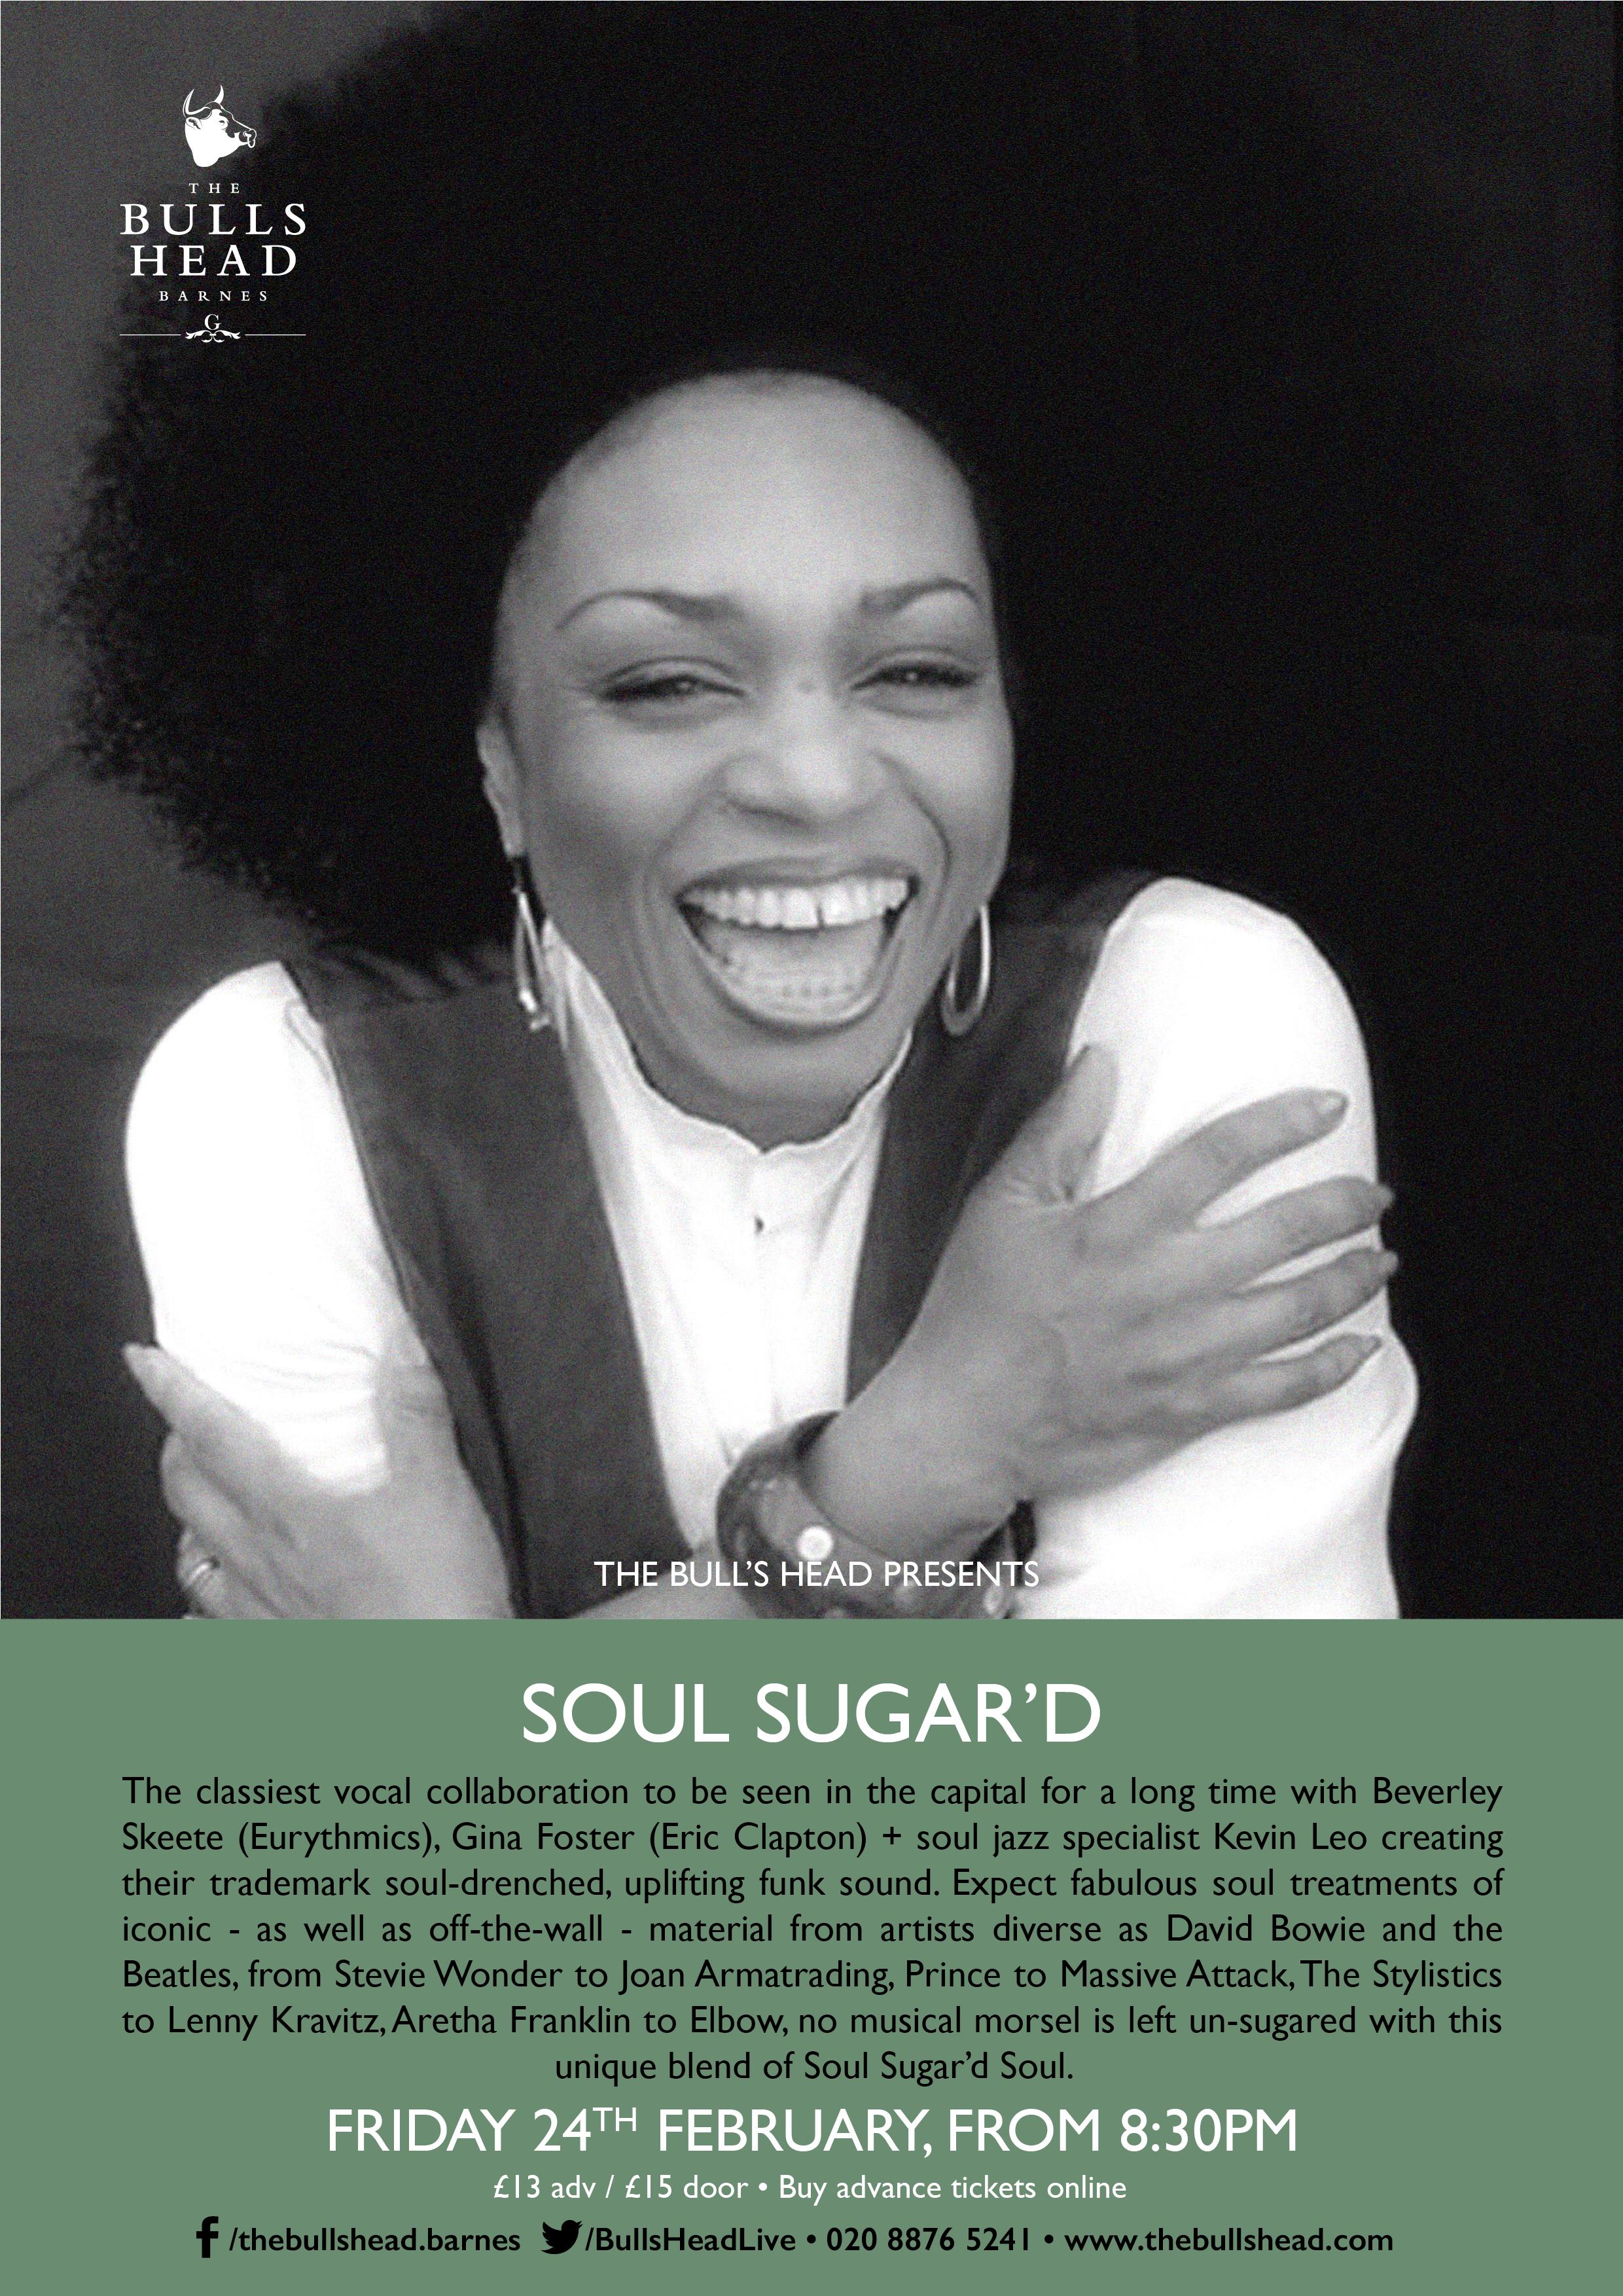 Soul Sugar'd